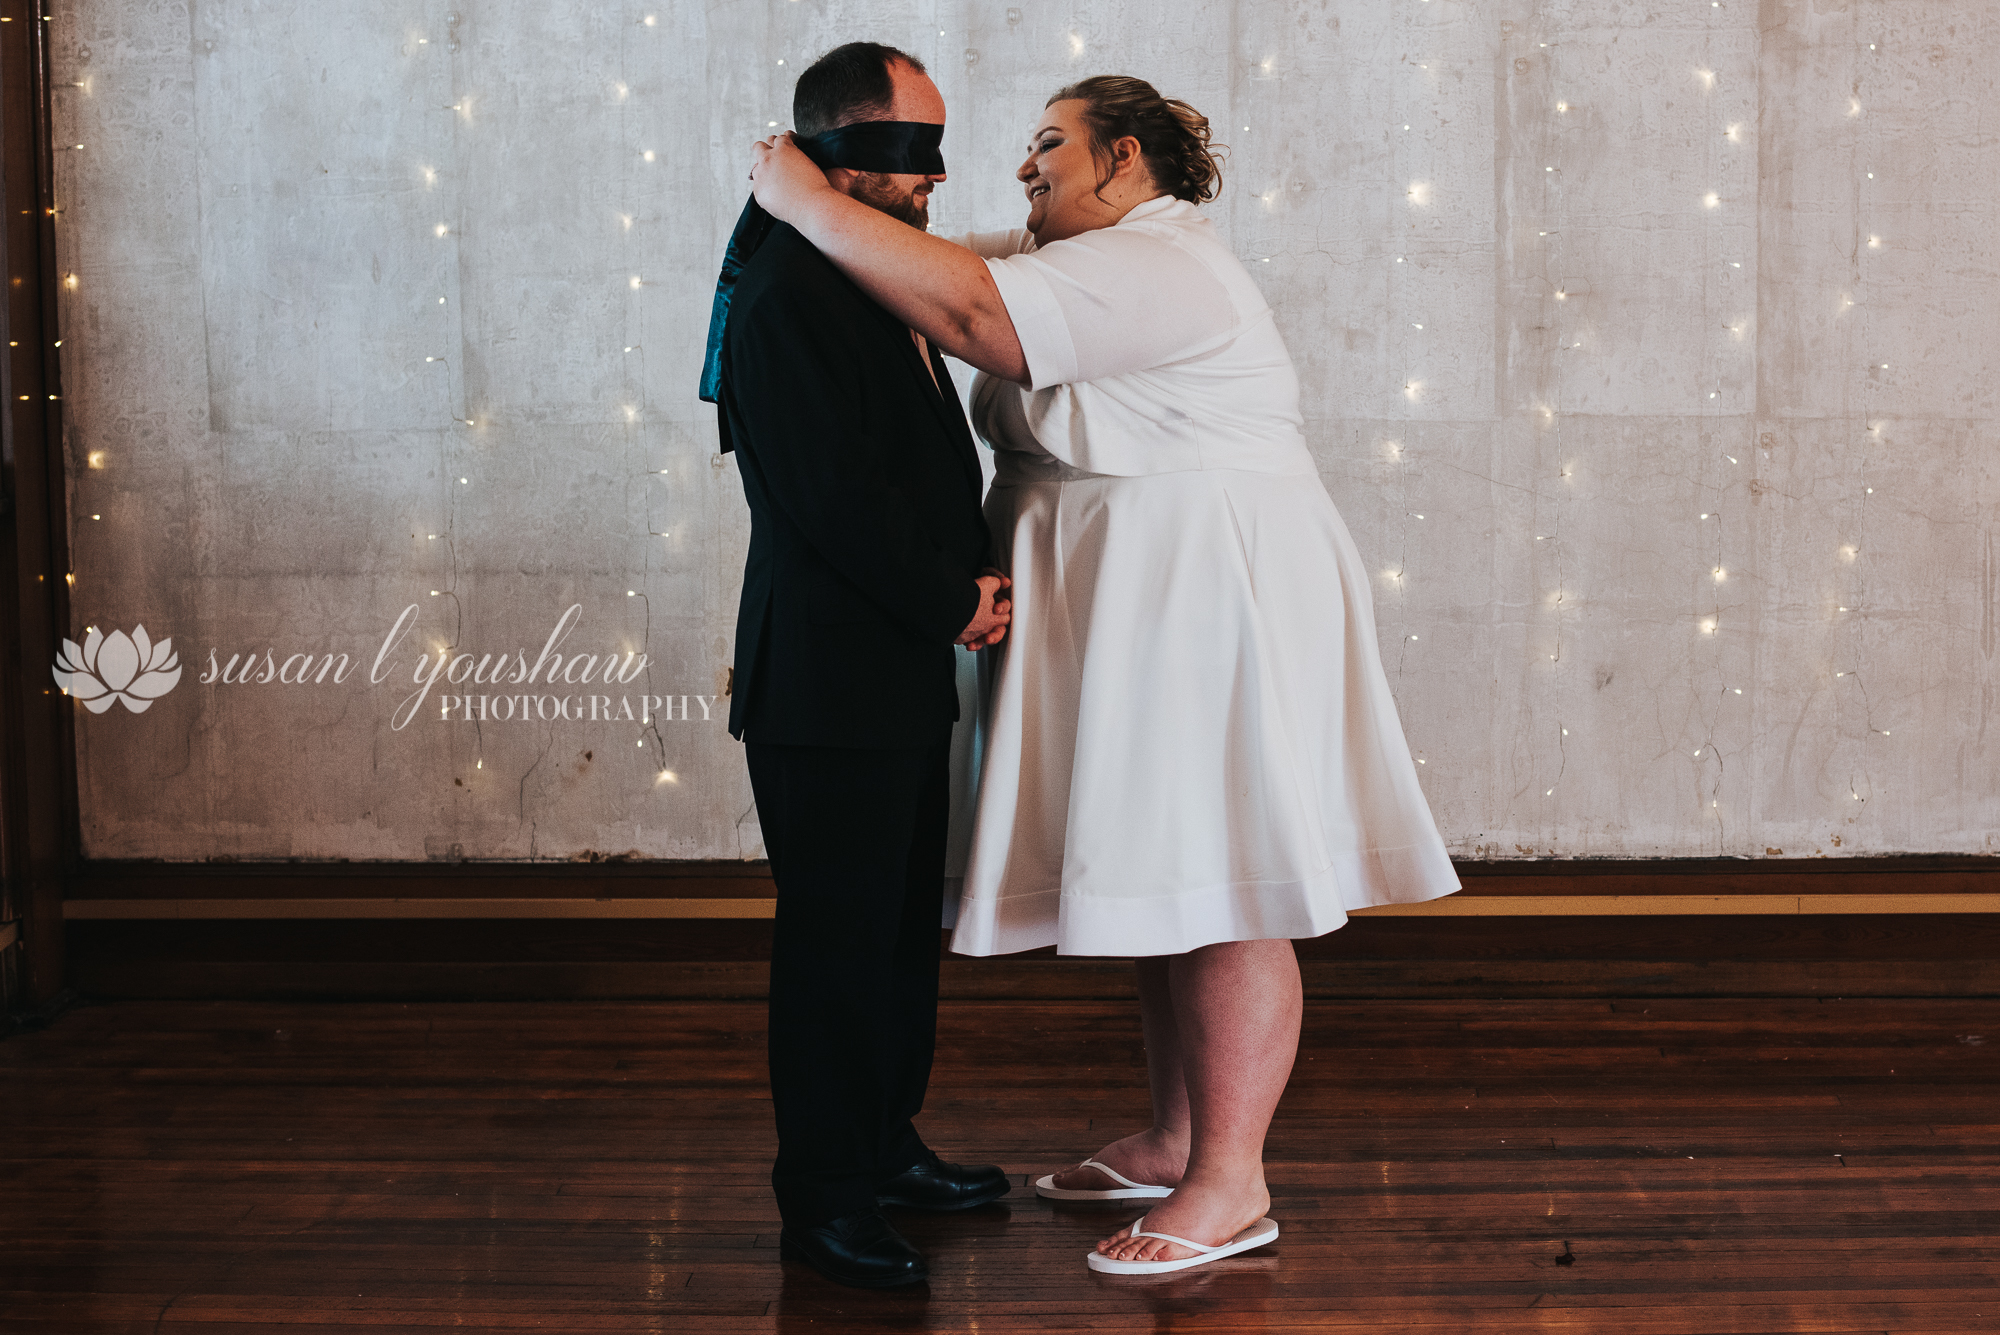 Bill and Sarah Wedding Photos 06-08-2019 SLY Photography -7.jpg